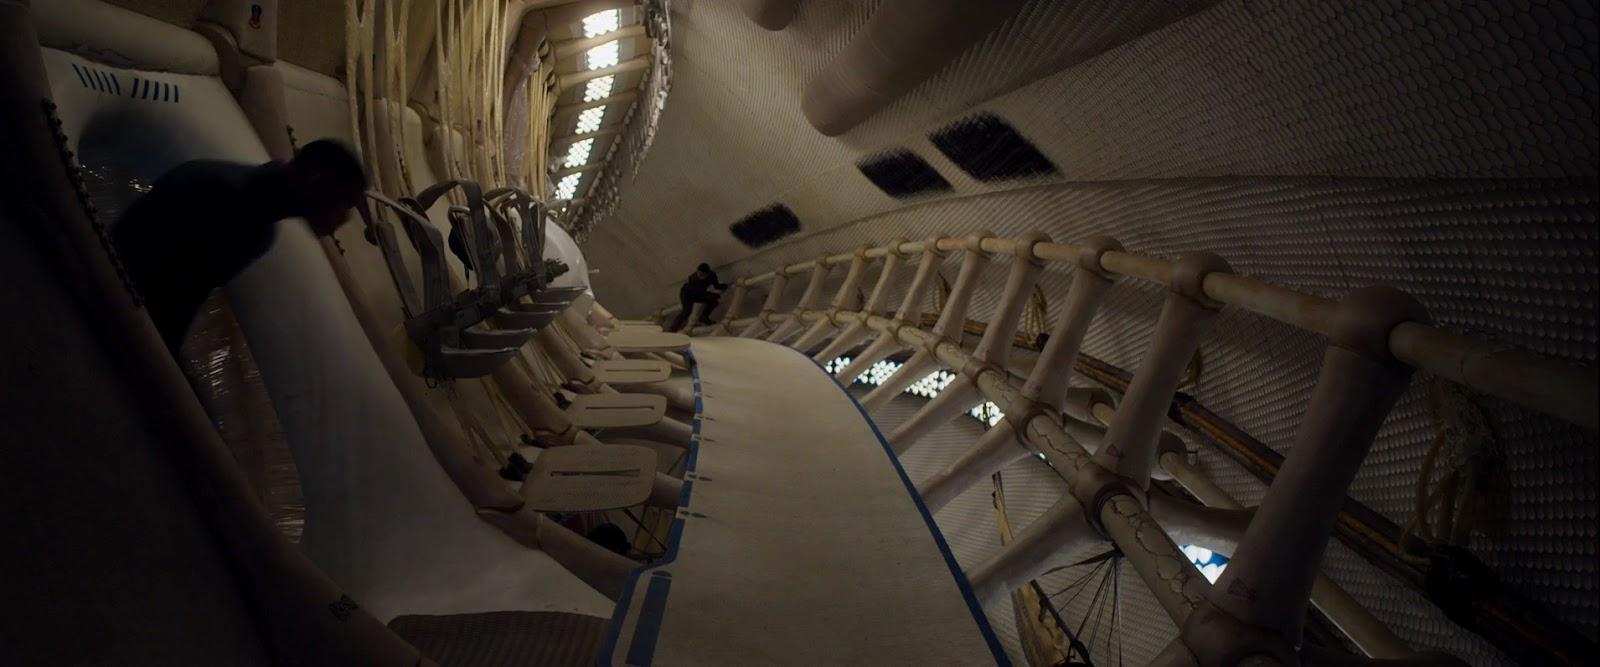 After Earth Official Trailer 2 Hd 1080p 123freewiringdiagrams Download -> Pelismegahd